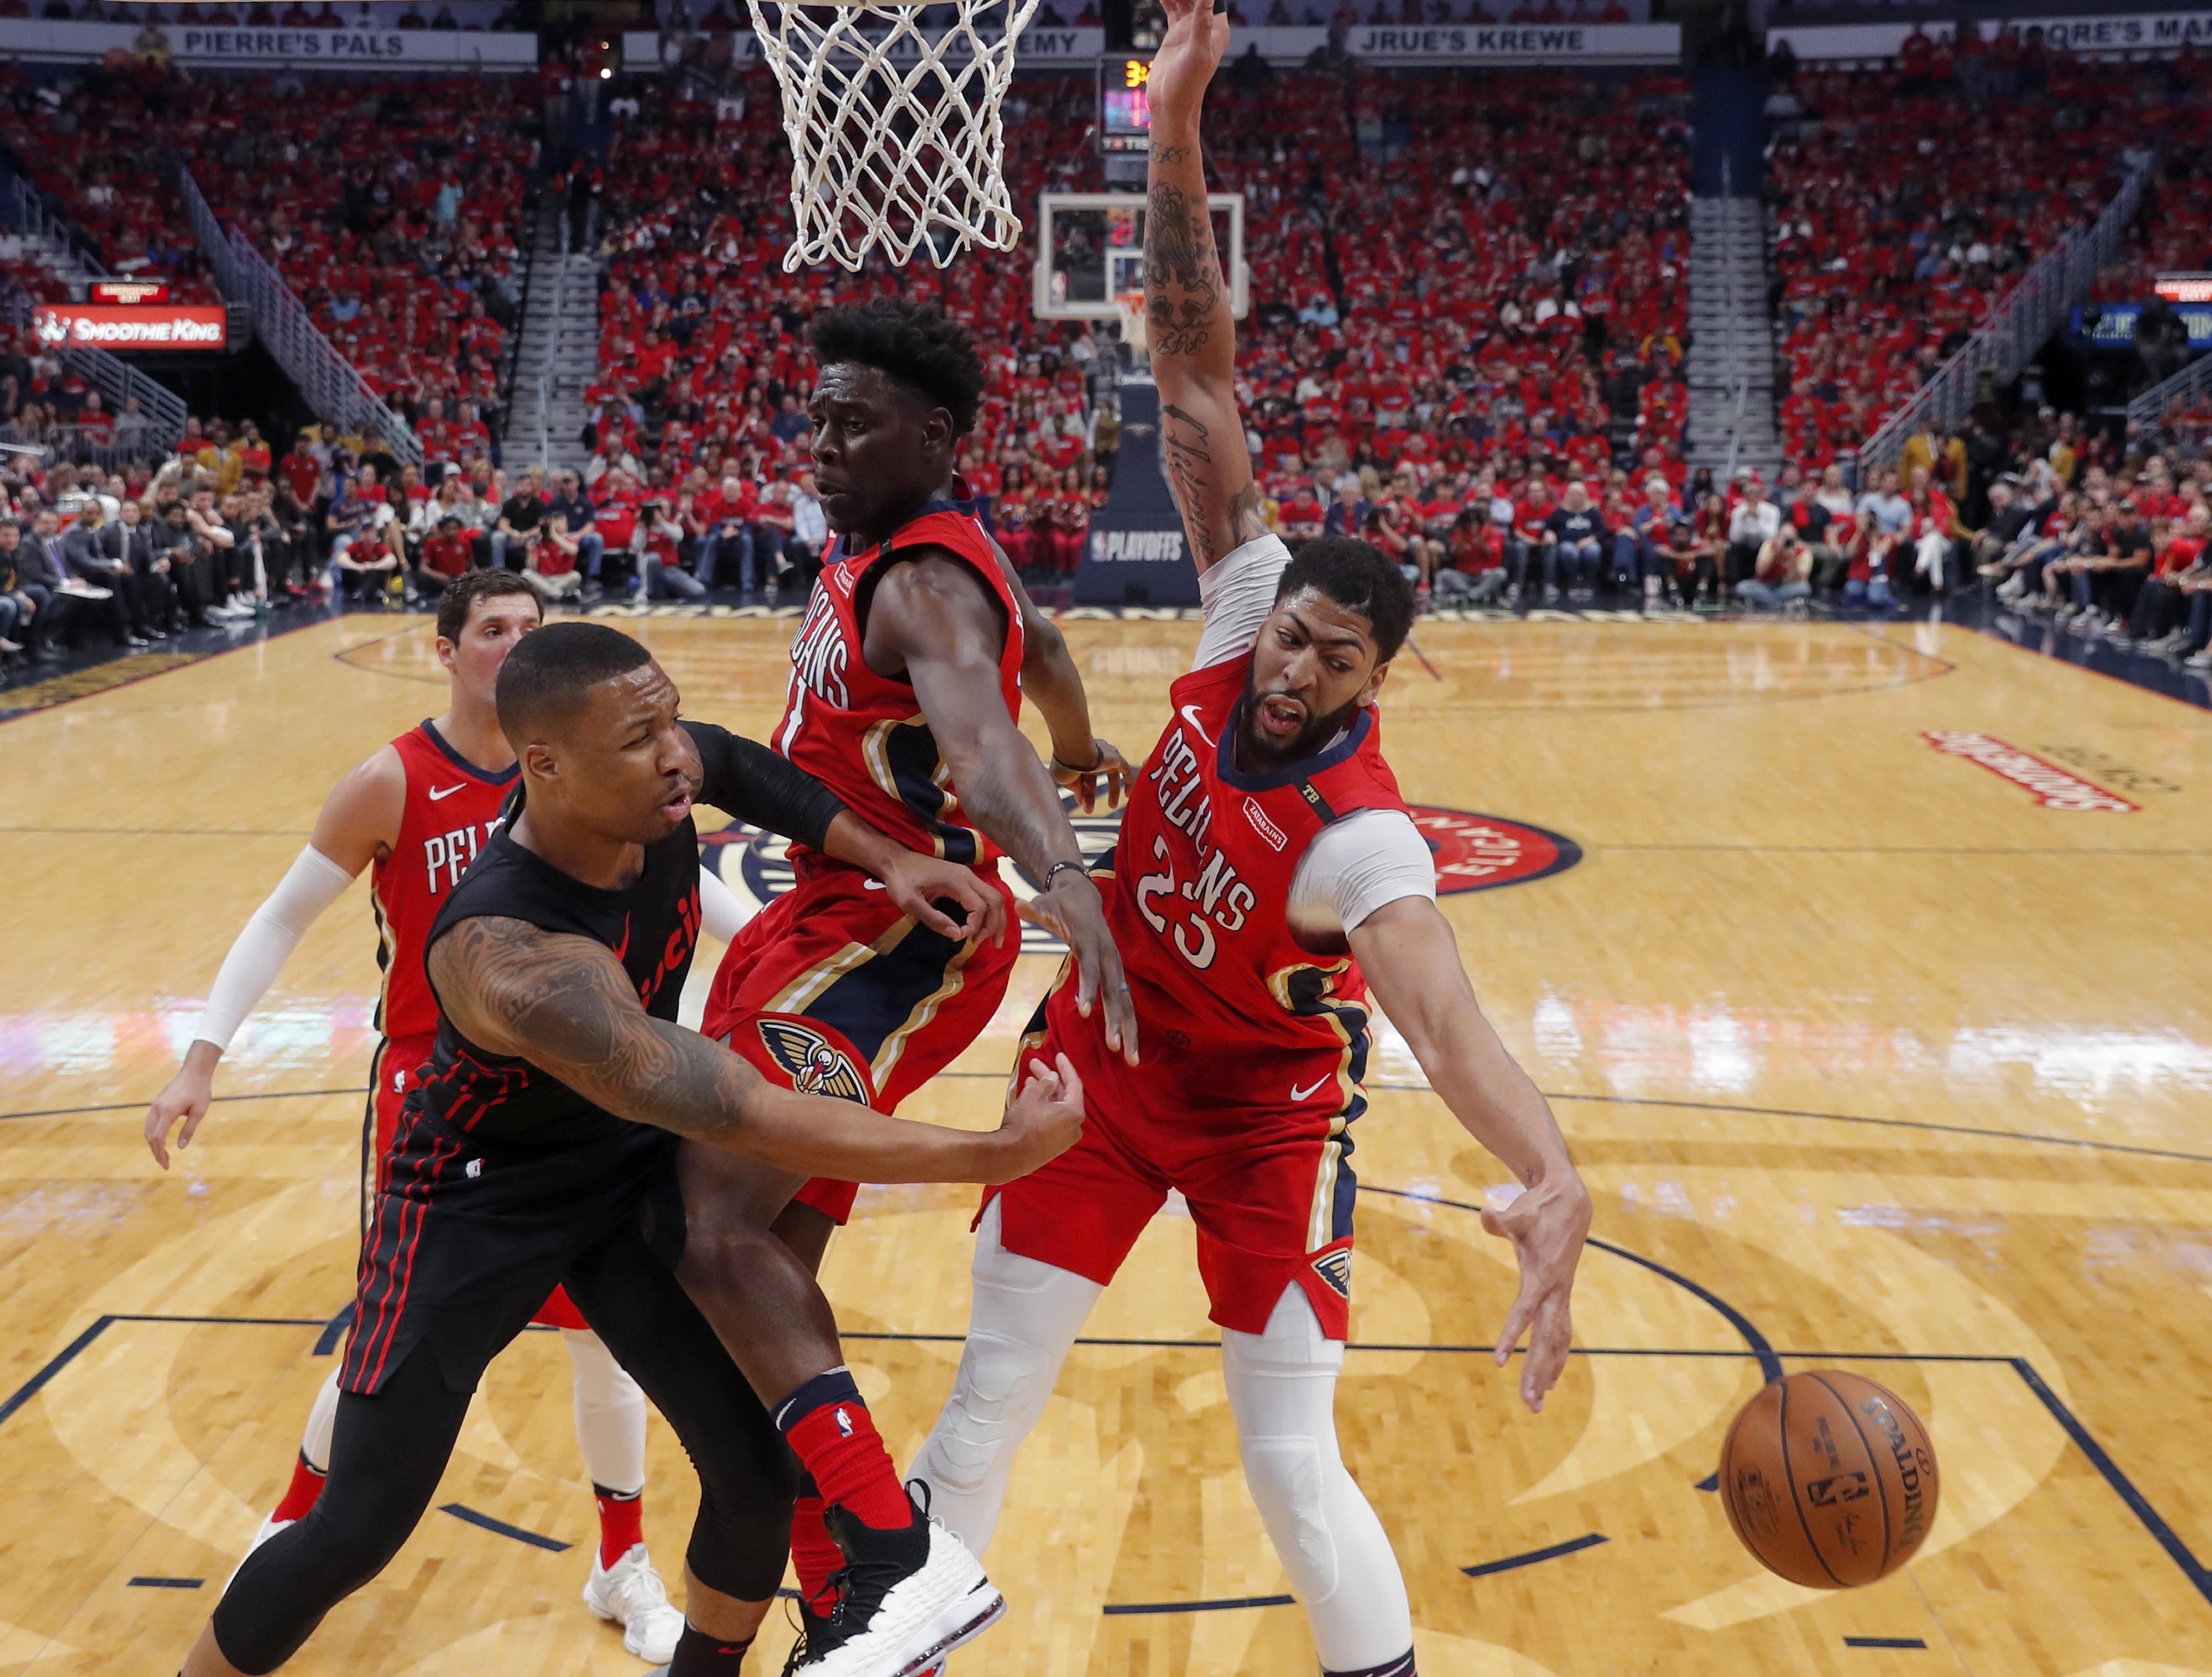 Nikola Mirotic Anthony Davis Lead Pelicans To Dominant Game 3 Win Over Blazers